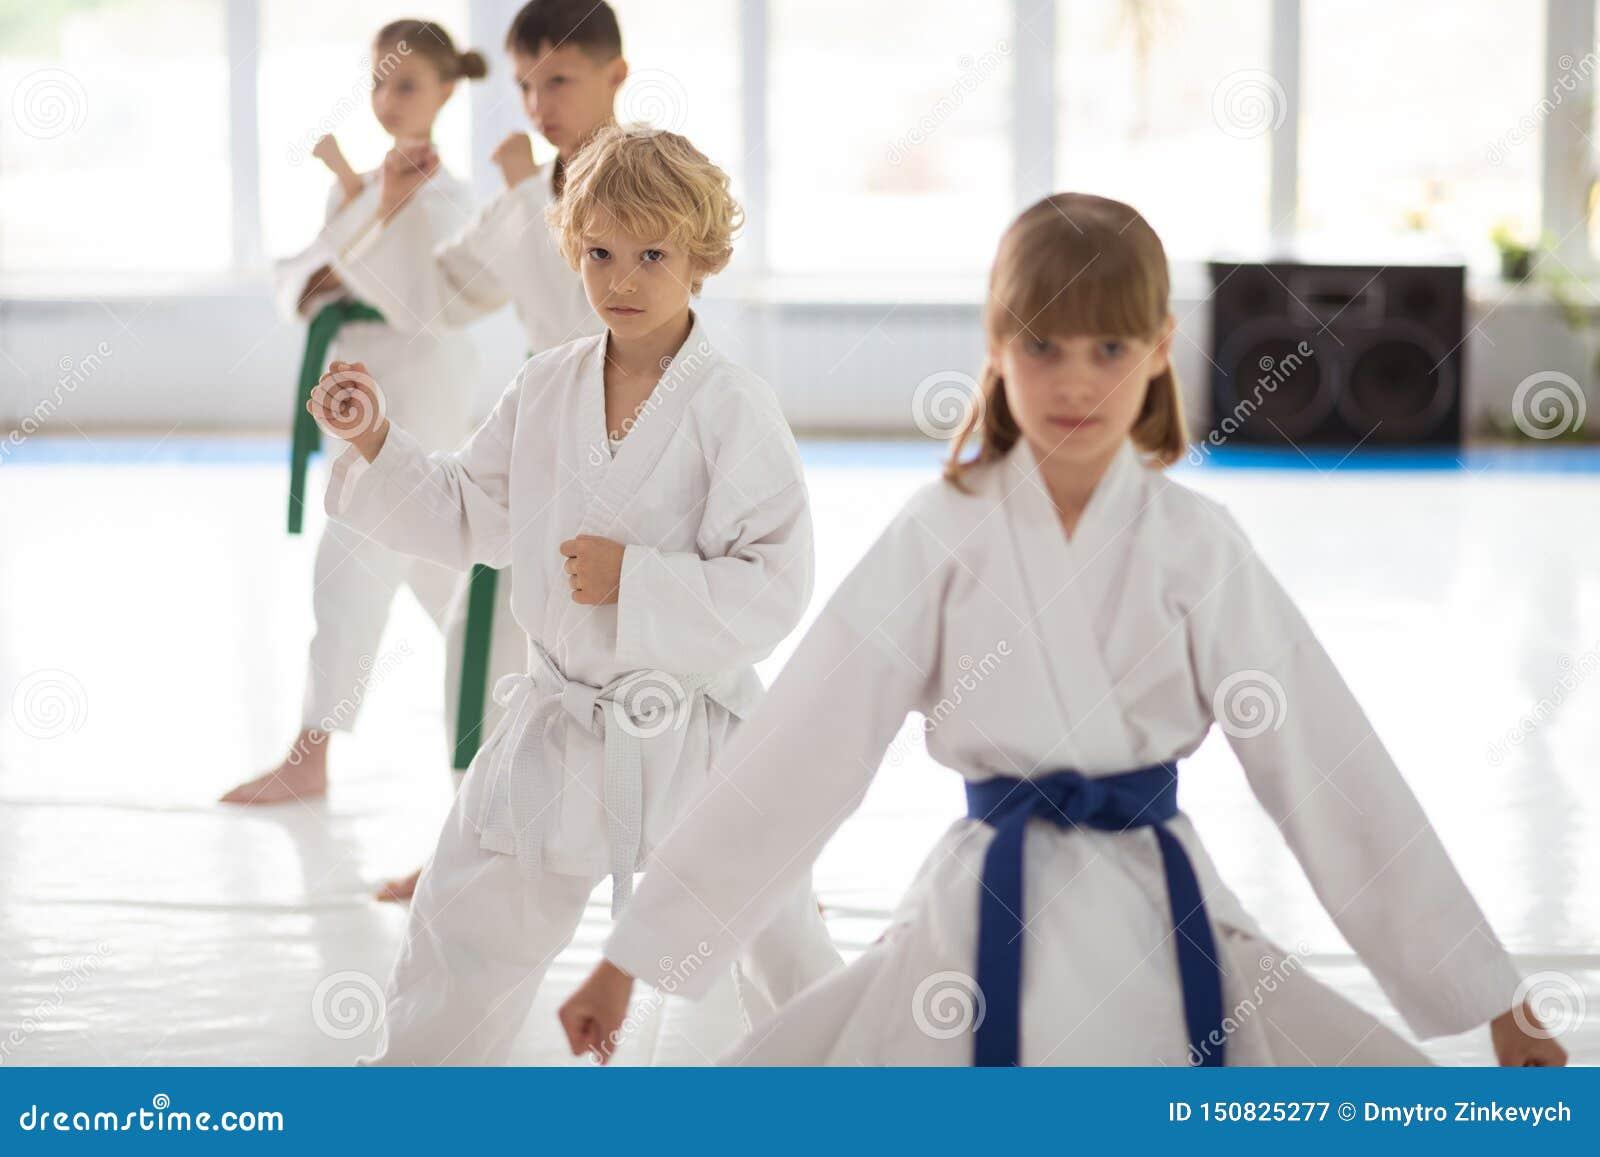 Sensibilità dei bambini in questione in arti marziali di pratica